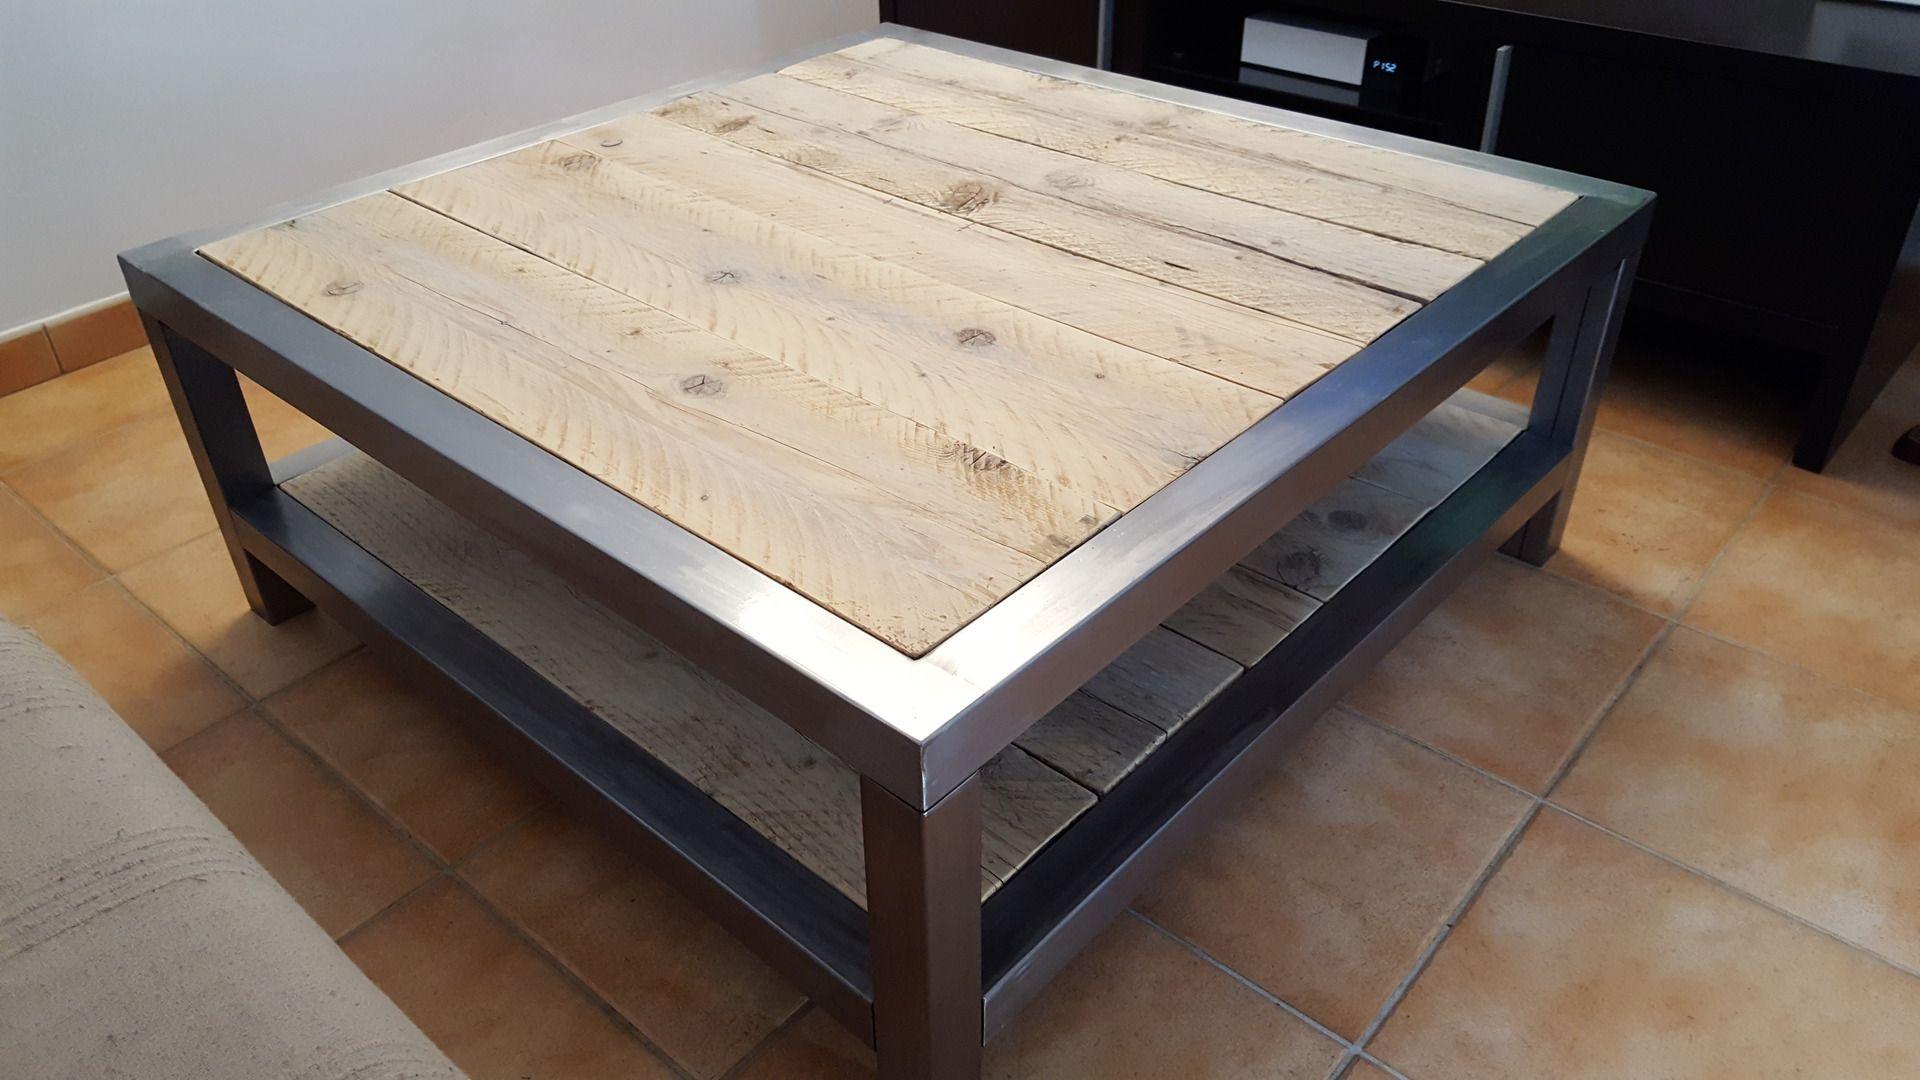 table basse industrielle metal et bois wood metal pinterest tables salons and metals. Black Bedroom Furniture Sets. Home Design Ideas